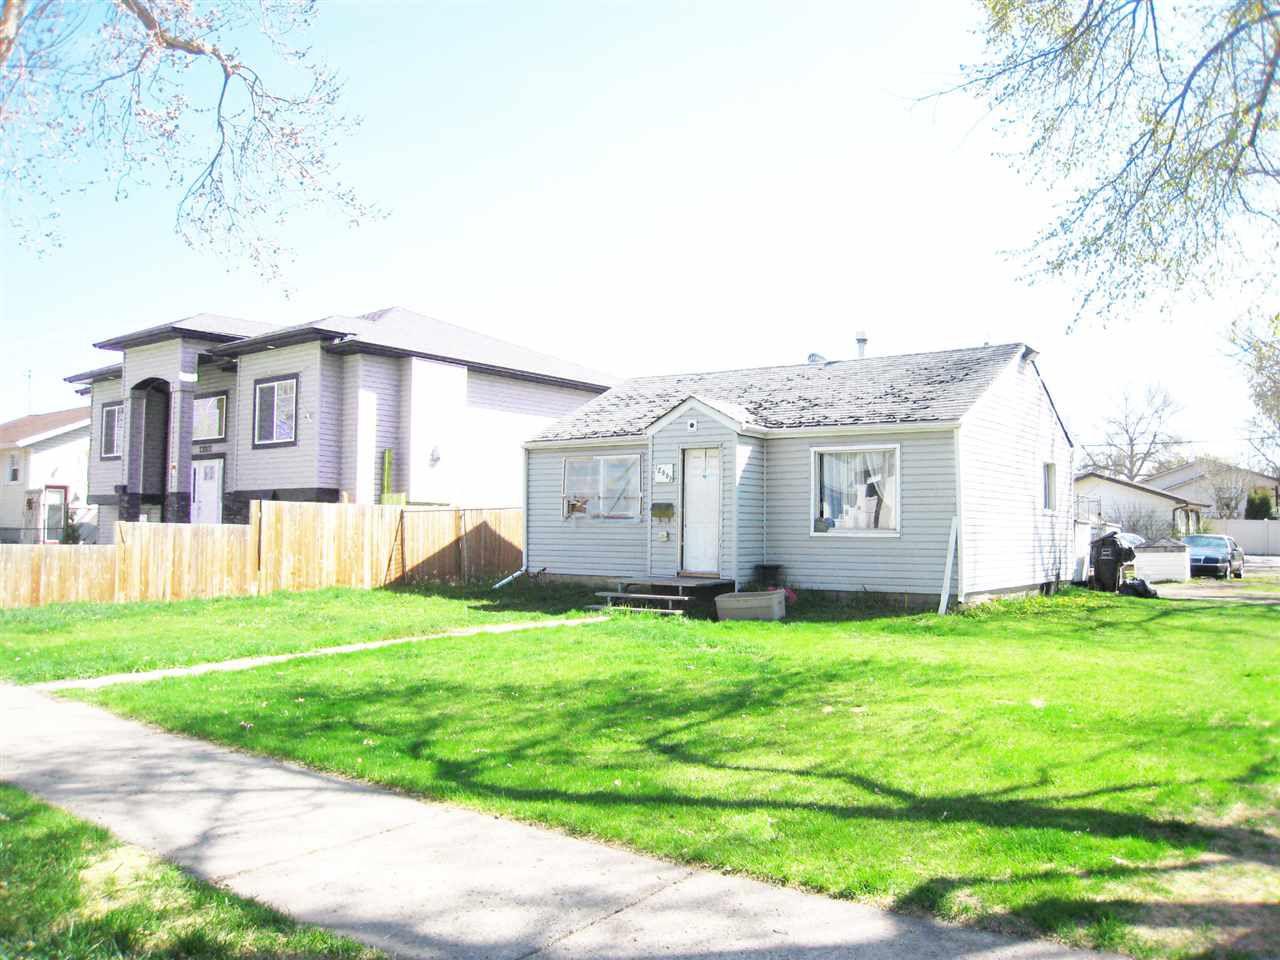 Main Photo: 12003 48 Street in Edmonton: Zone 23 House for sale : MLS®# E4157211